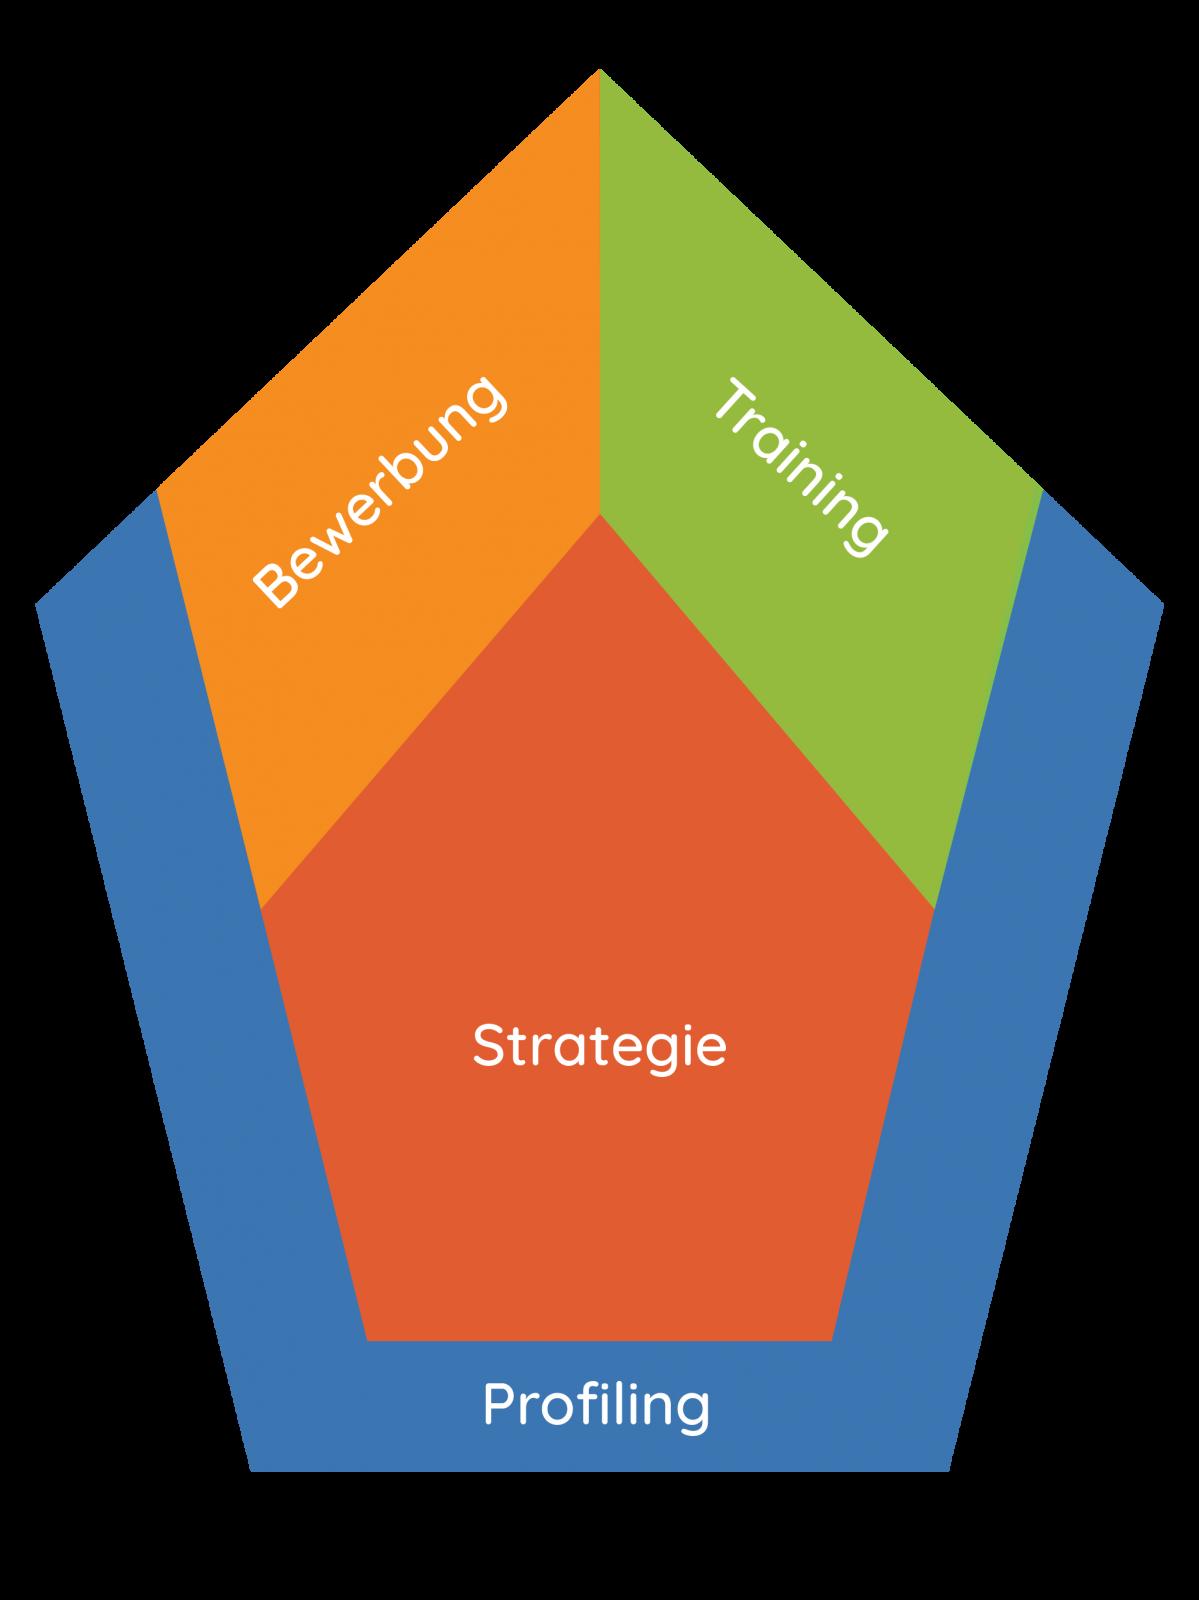 Das 4-Phasen-Modell Profiling Strategie Bewerbung Training